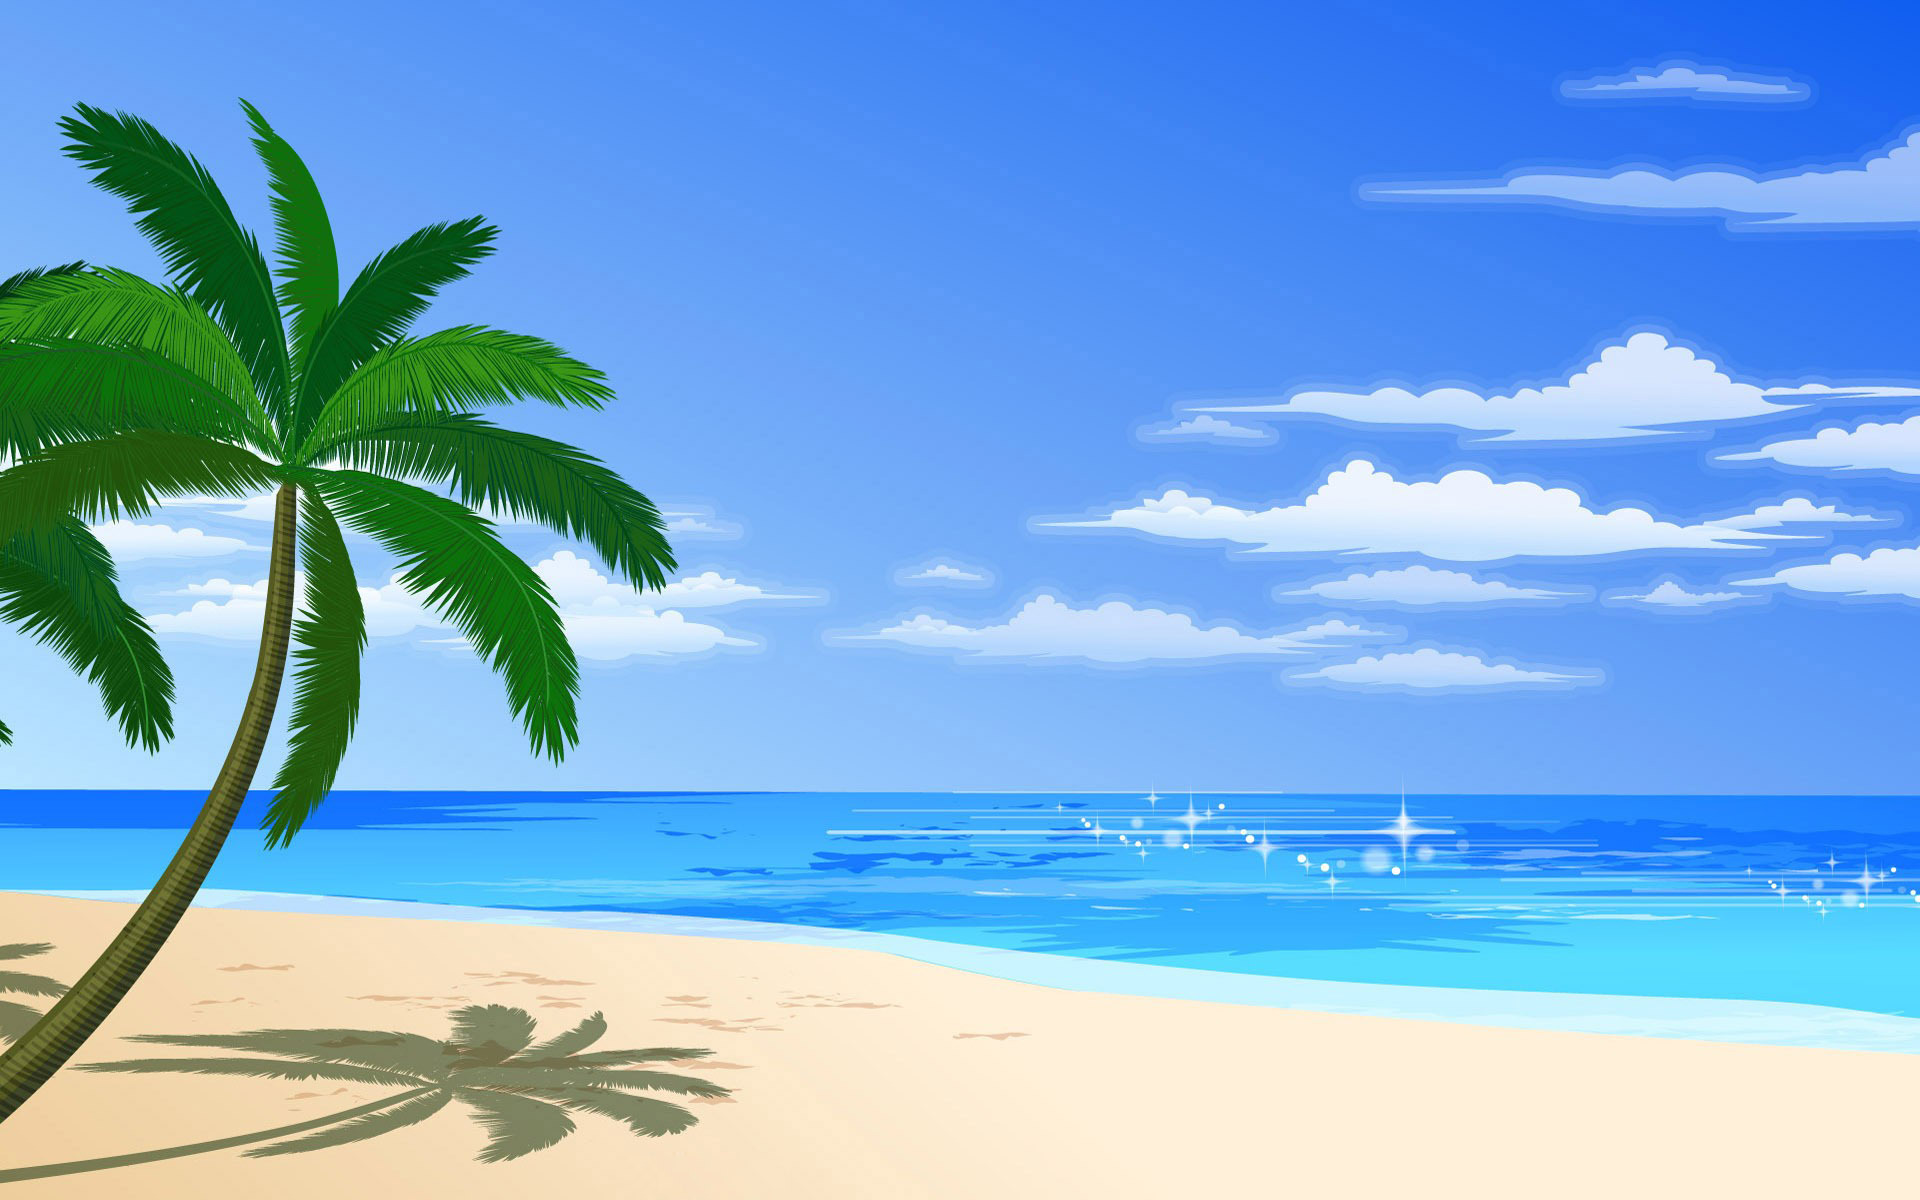 Single palm tree wallpaper 14296 1920x1200